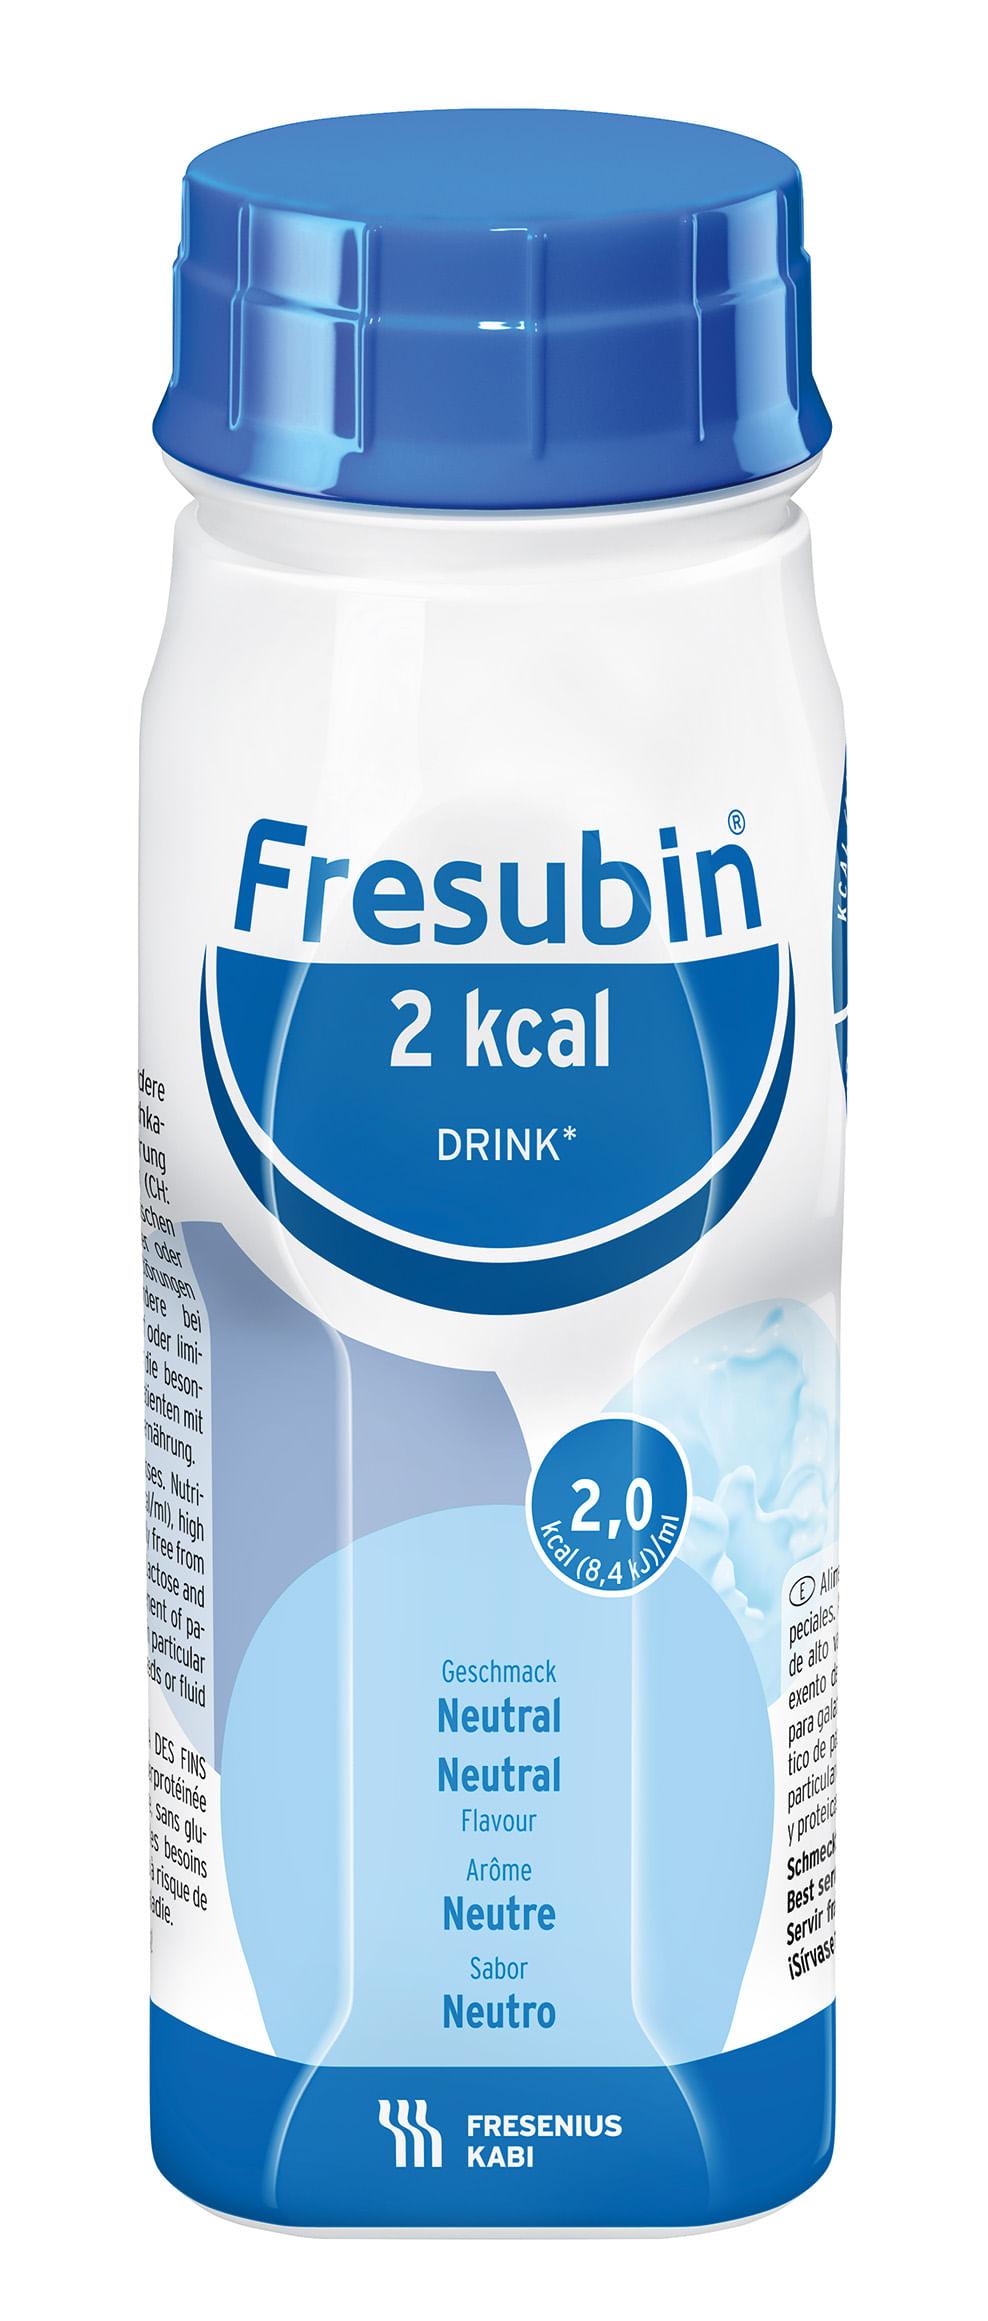 Fresubin_2kcal_Neutral_EBo_Frontal